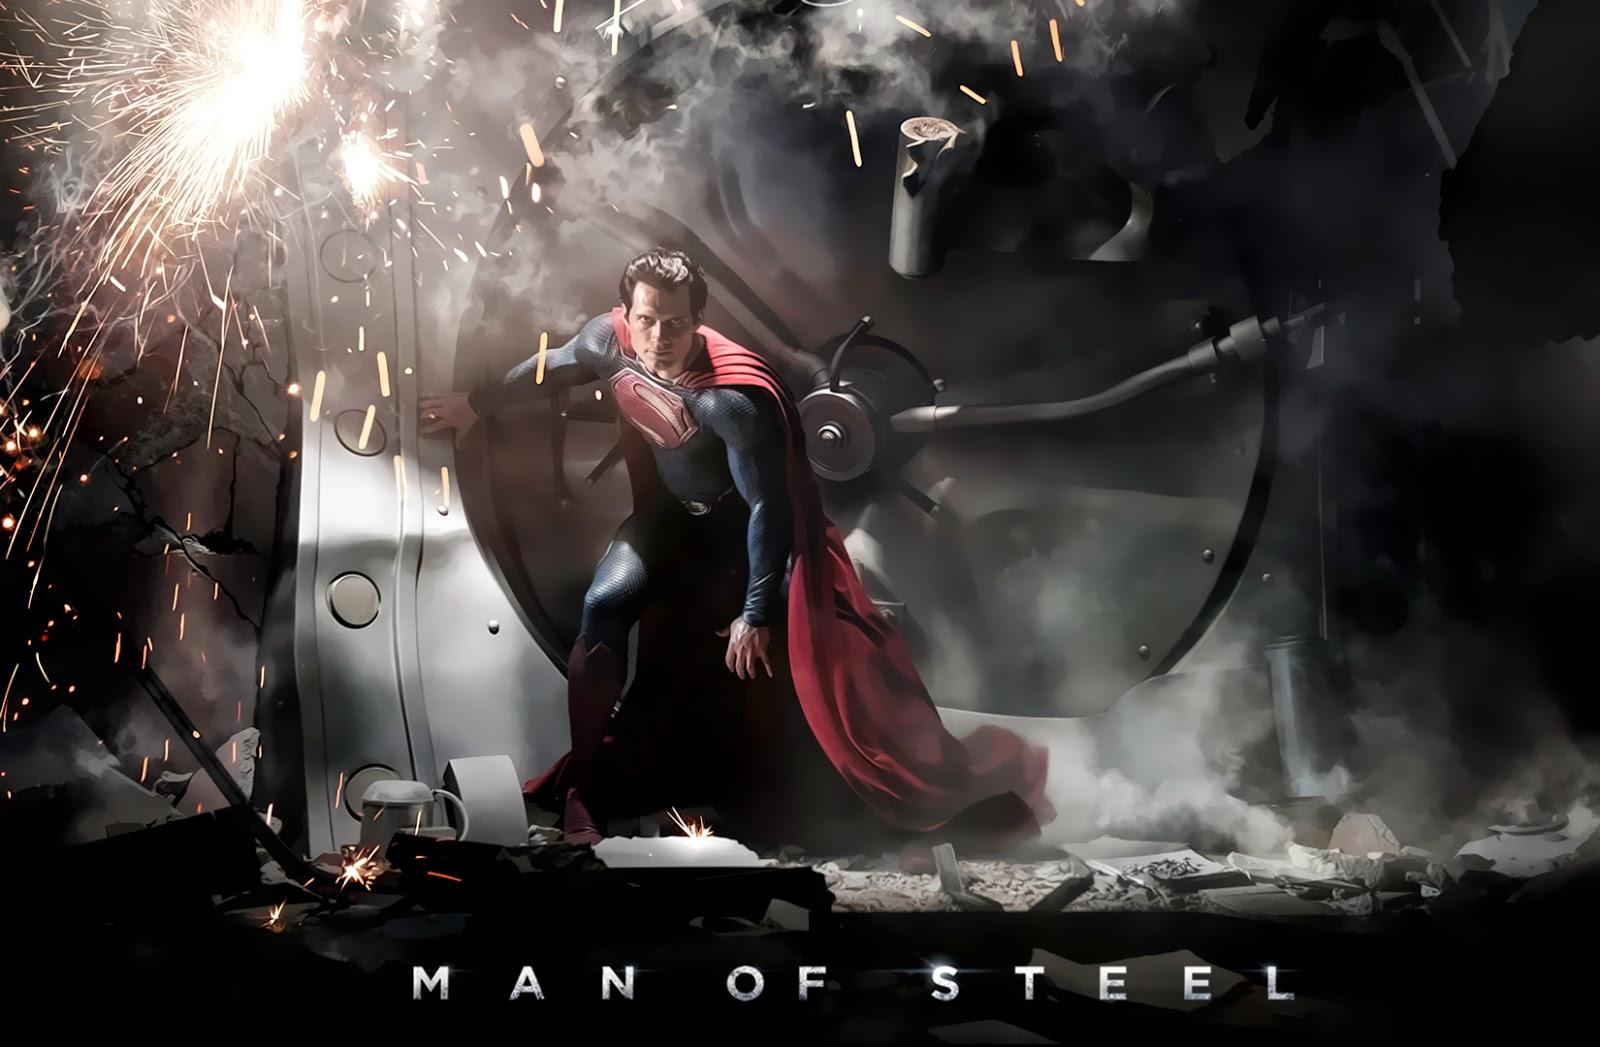 http://2.bp.blogspot.com/-hhY6LSau9jY/Ub27hFfx2DI/AAAAAAAAB7M/lDn8_b7b3A0/s1600/Man-Of-Steel-wallpaper-2.jpg